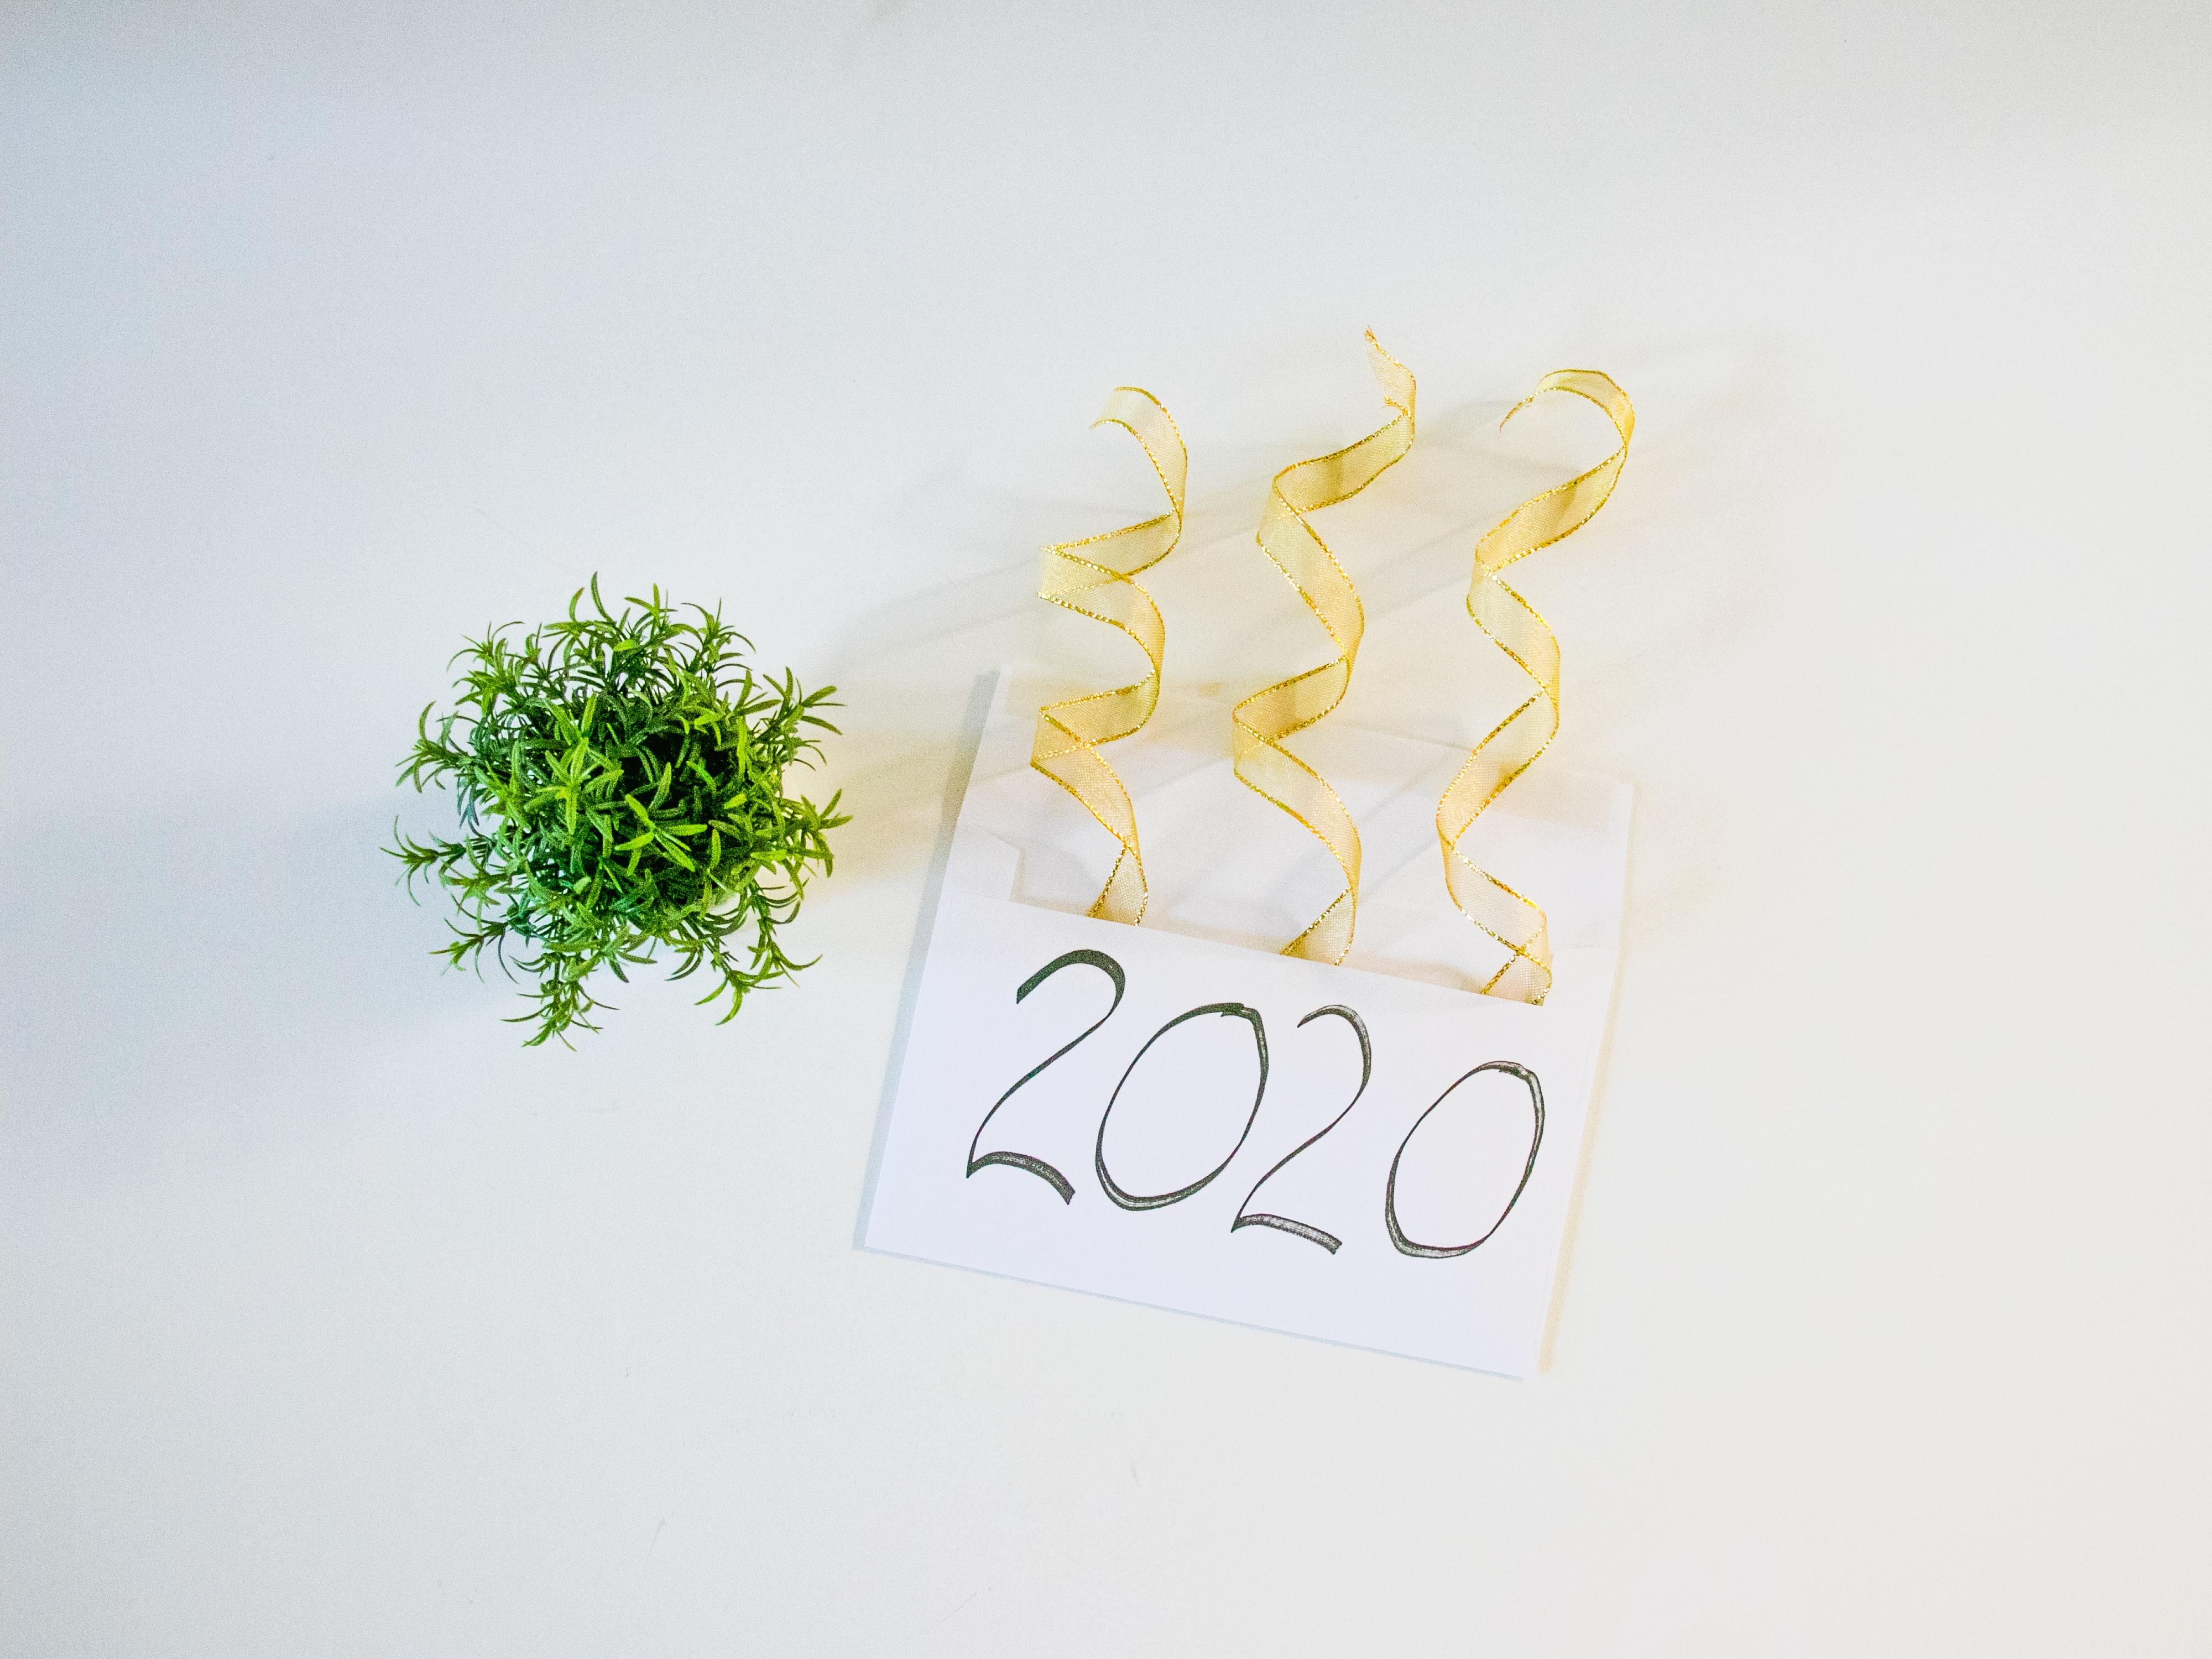 Top 5 Training Trends in 2020